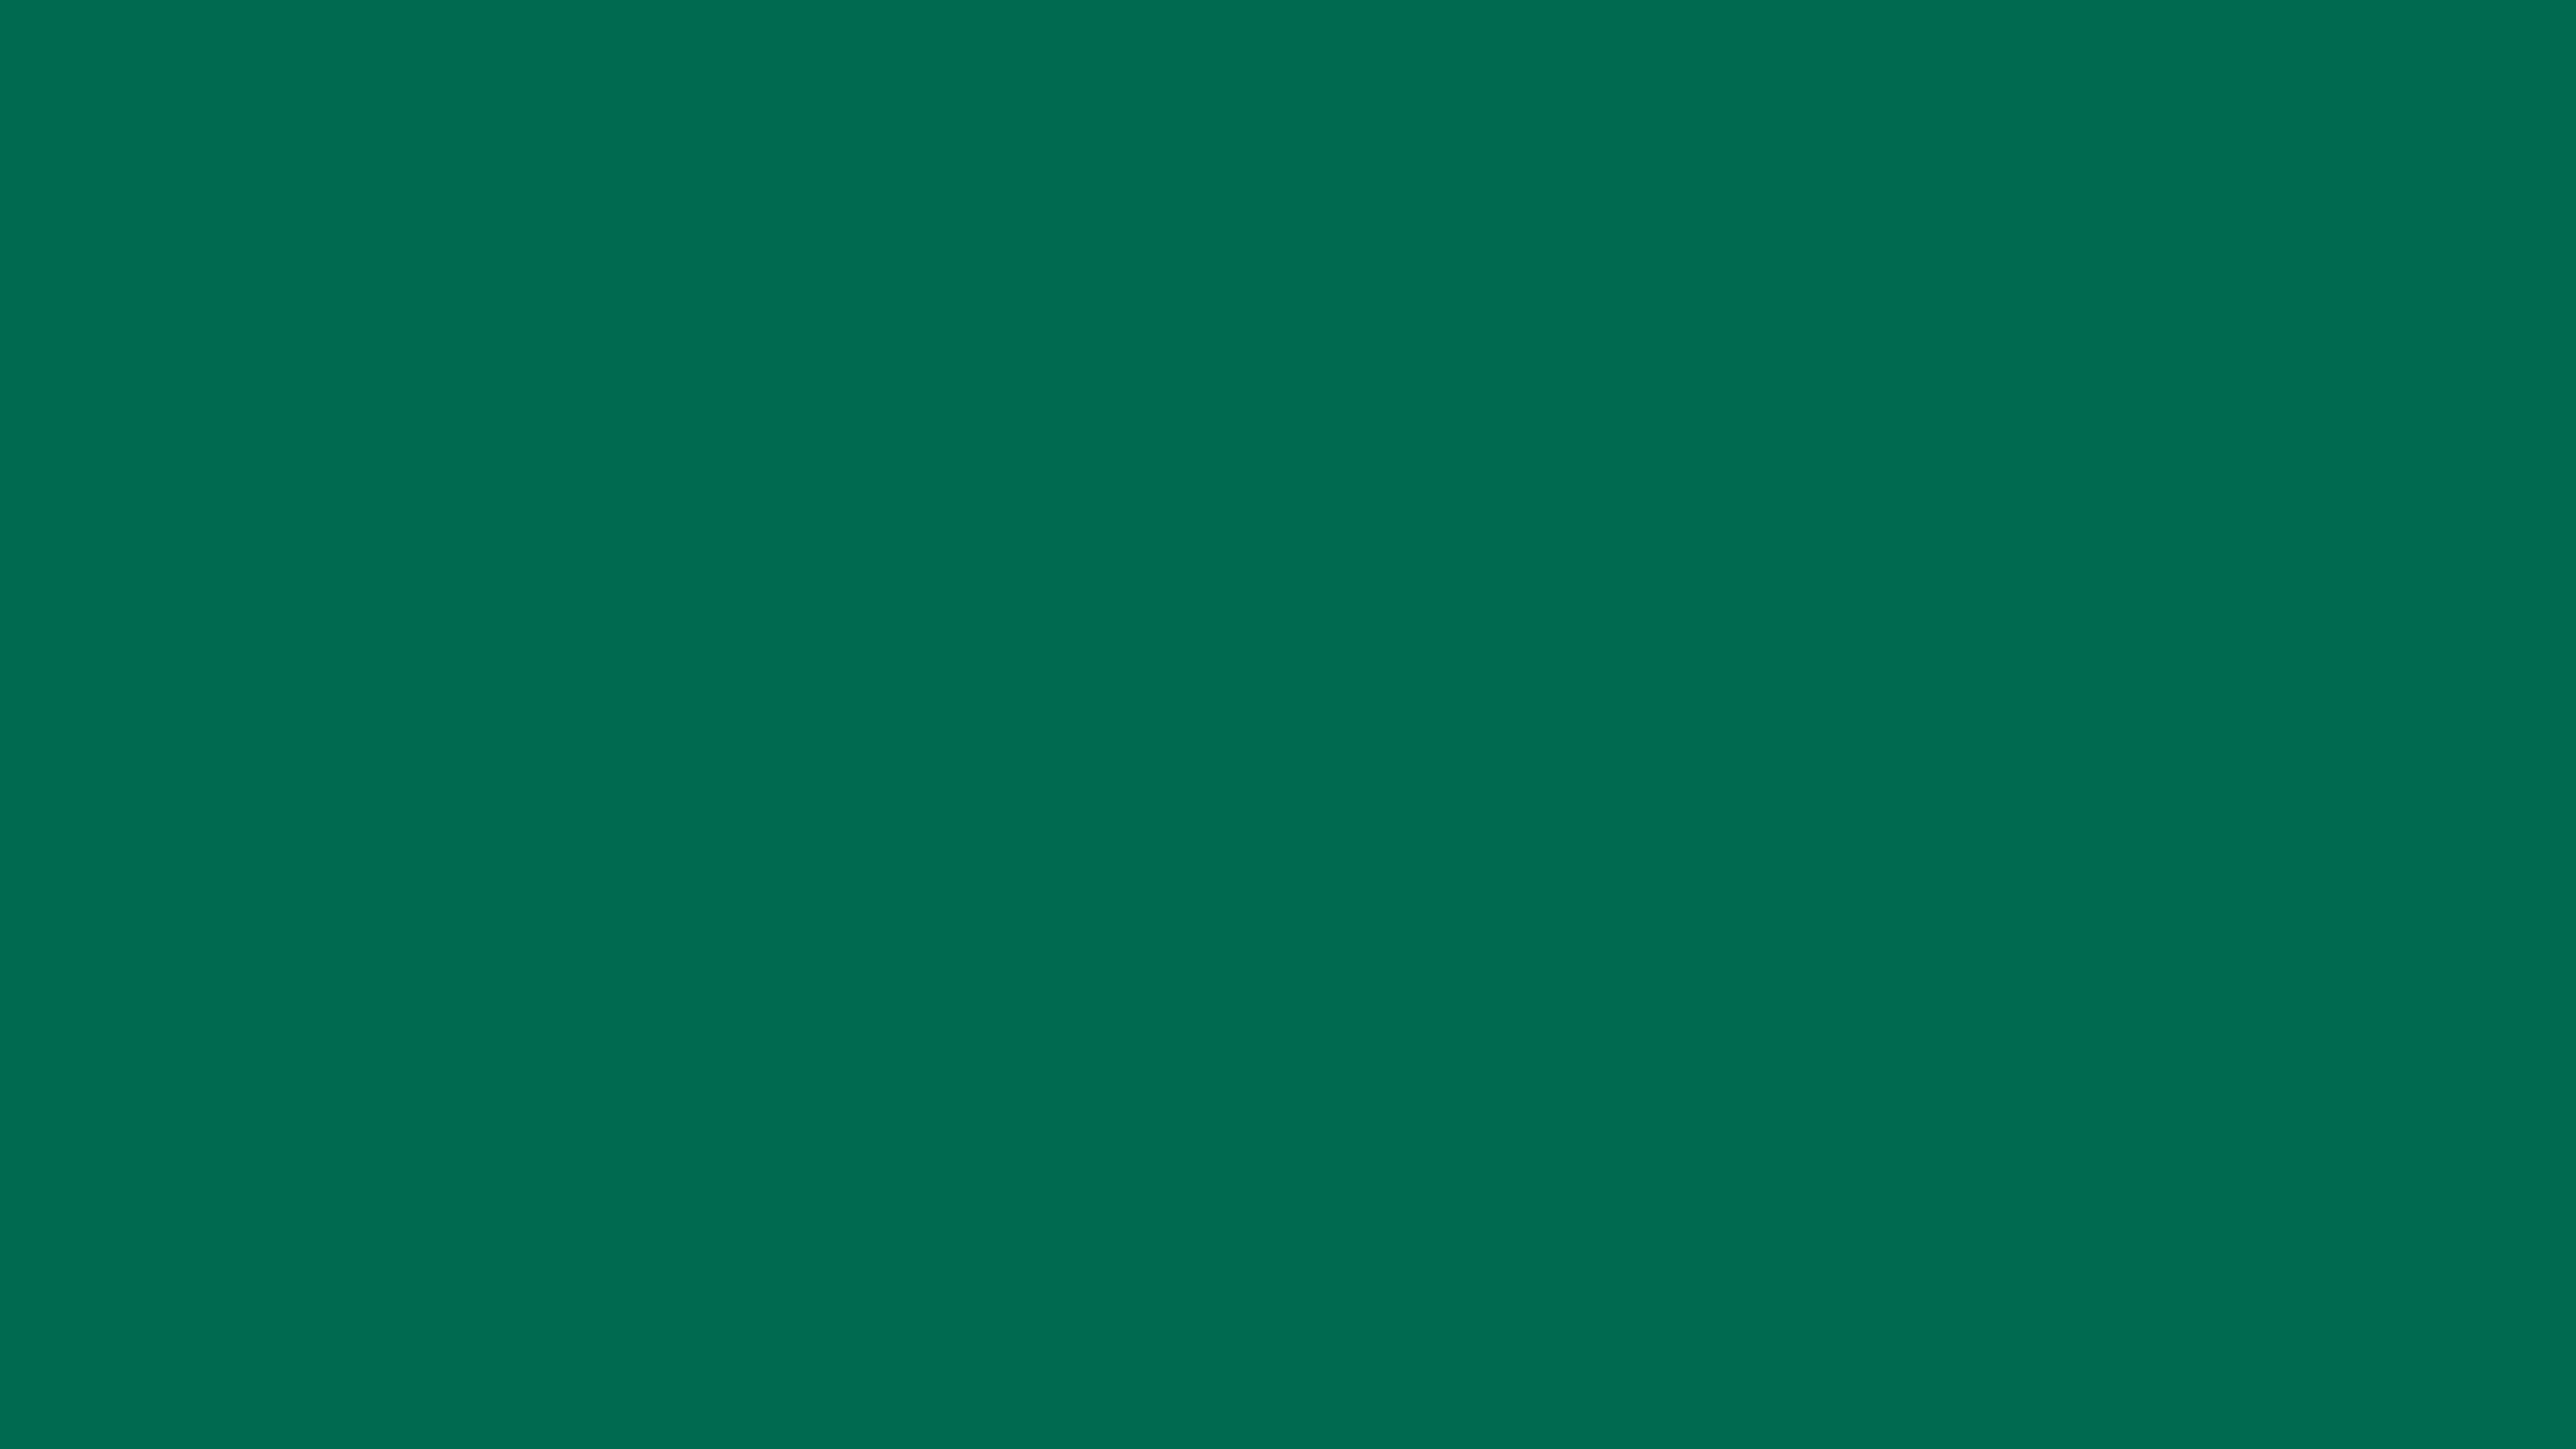 4096x2304 Bottle Green Solid Color Background